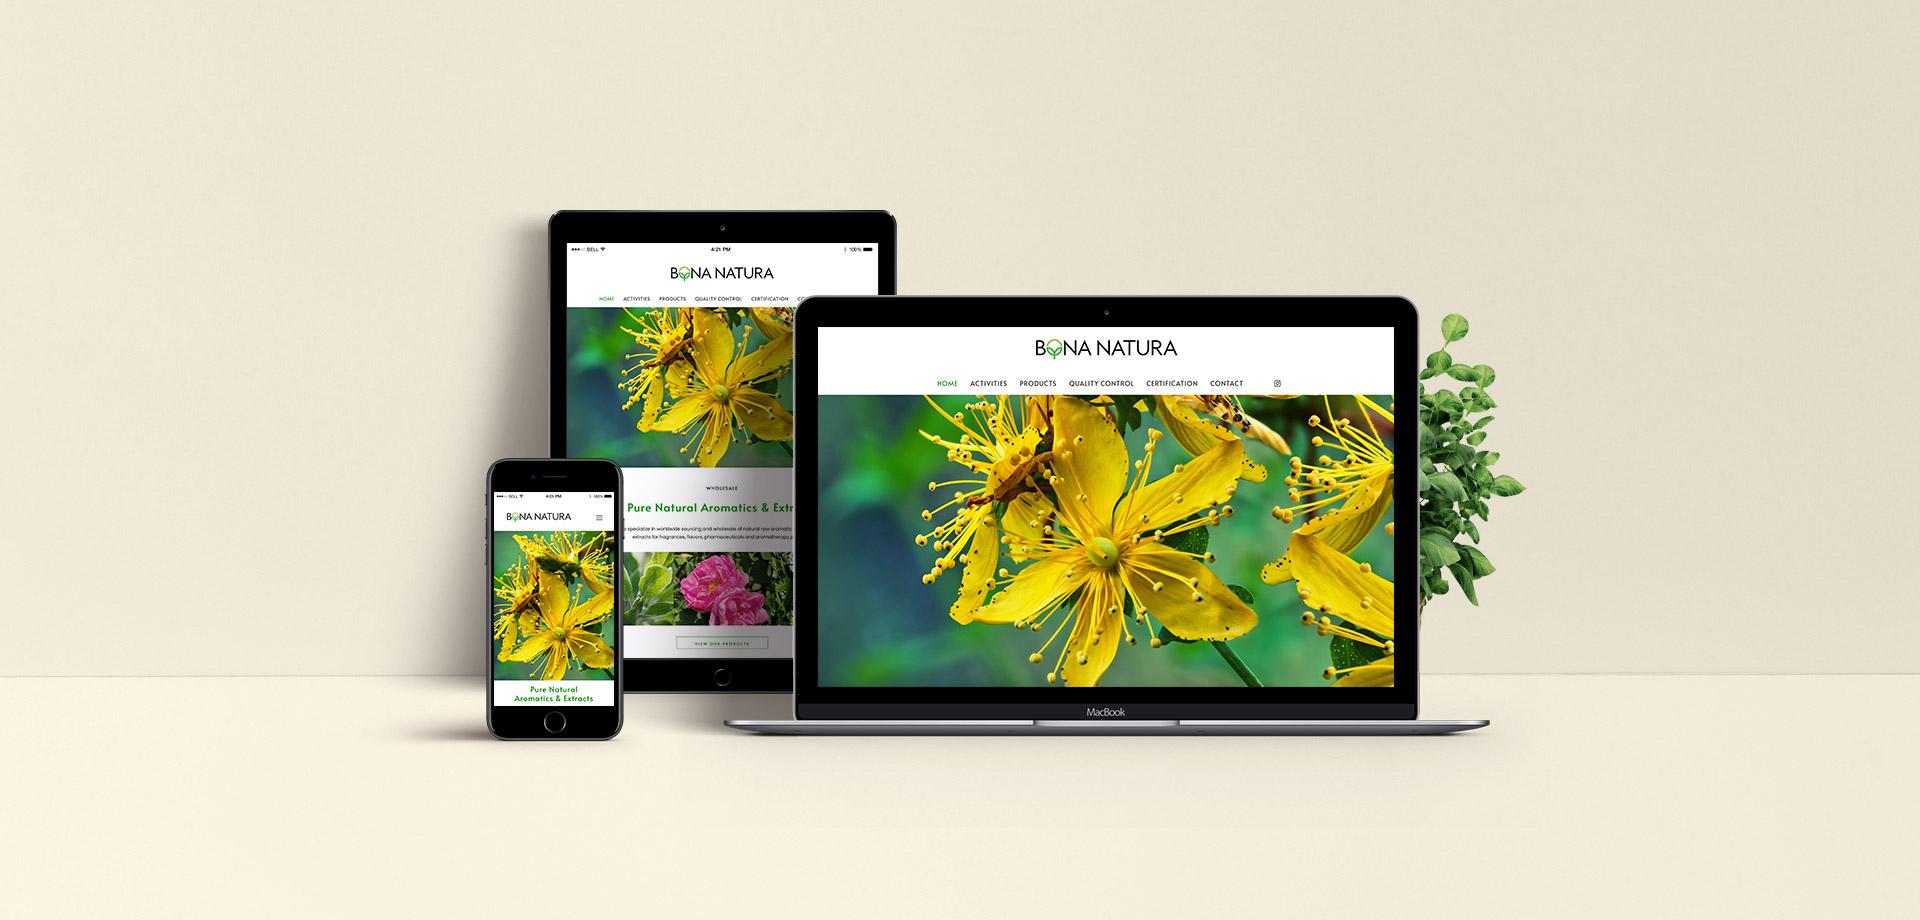 bonanatura-webshowcase